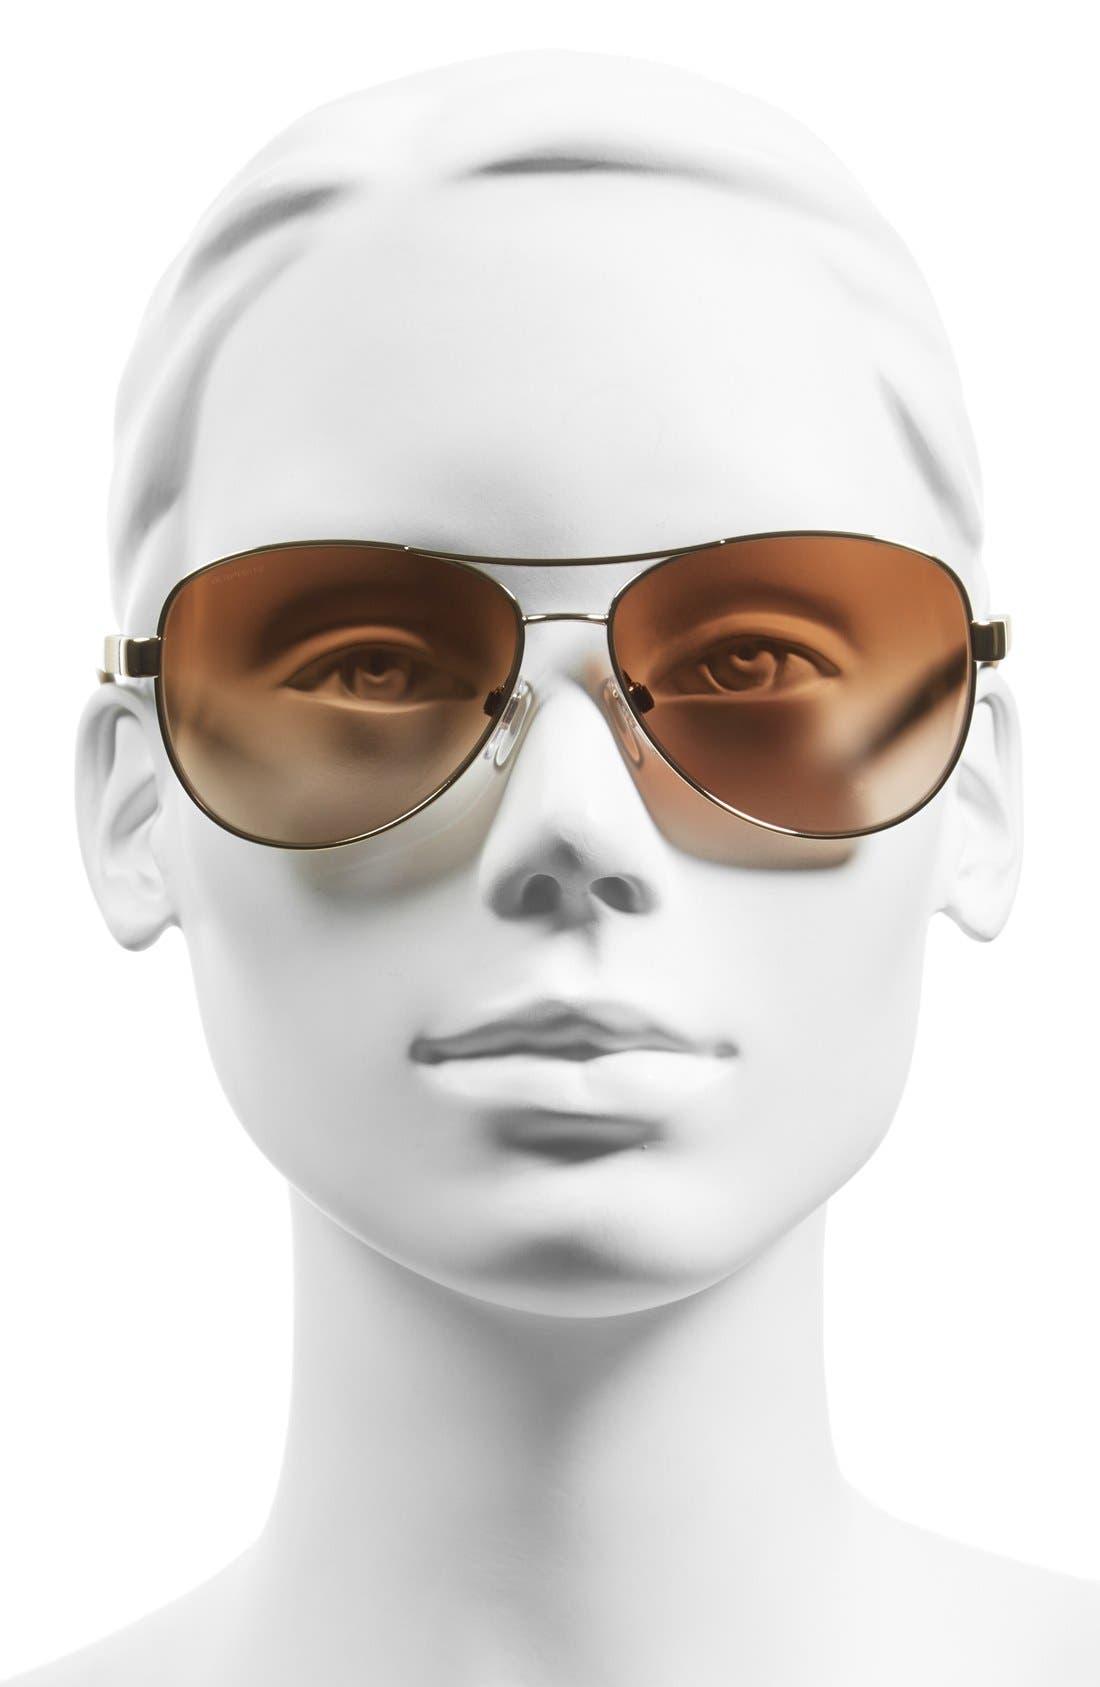 59mm Aviator Sunglasses,                             Alternate thumbnail 2, color,                             710